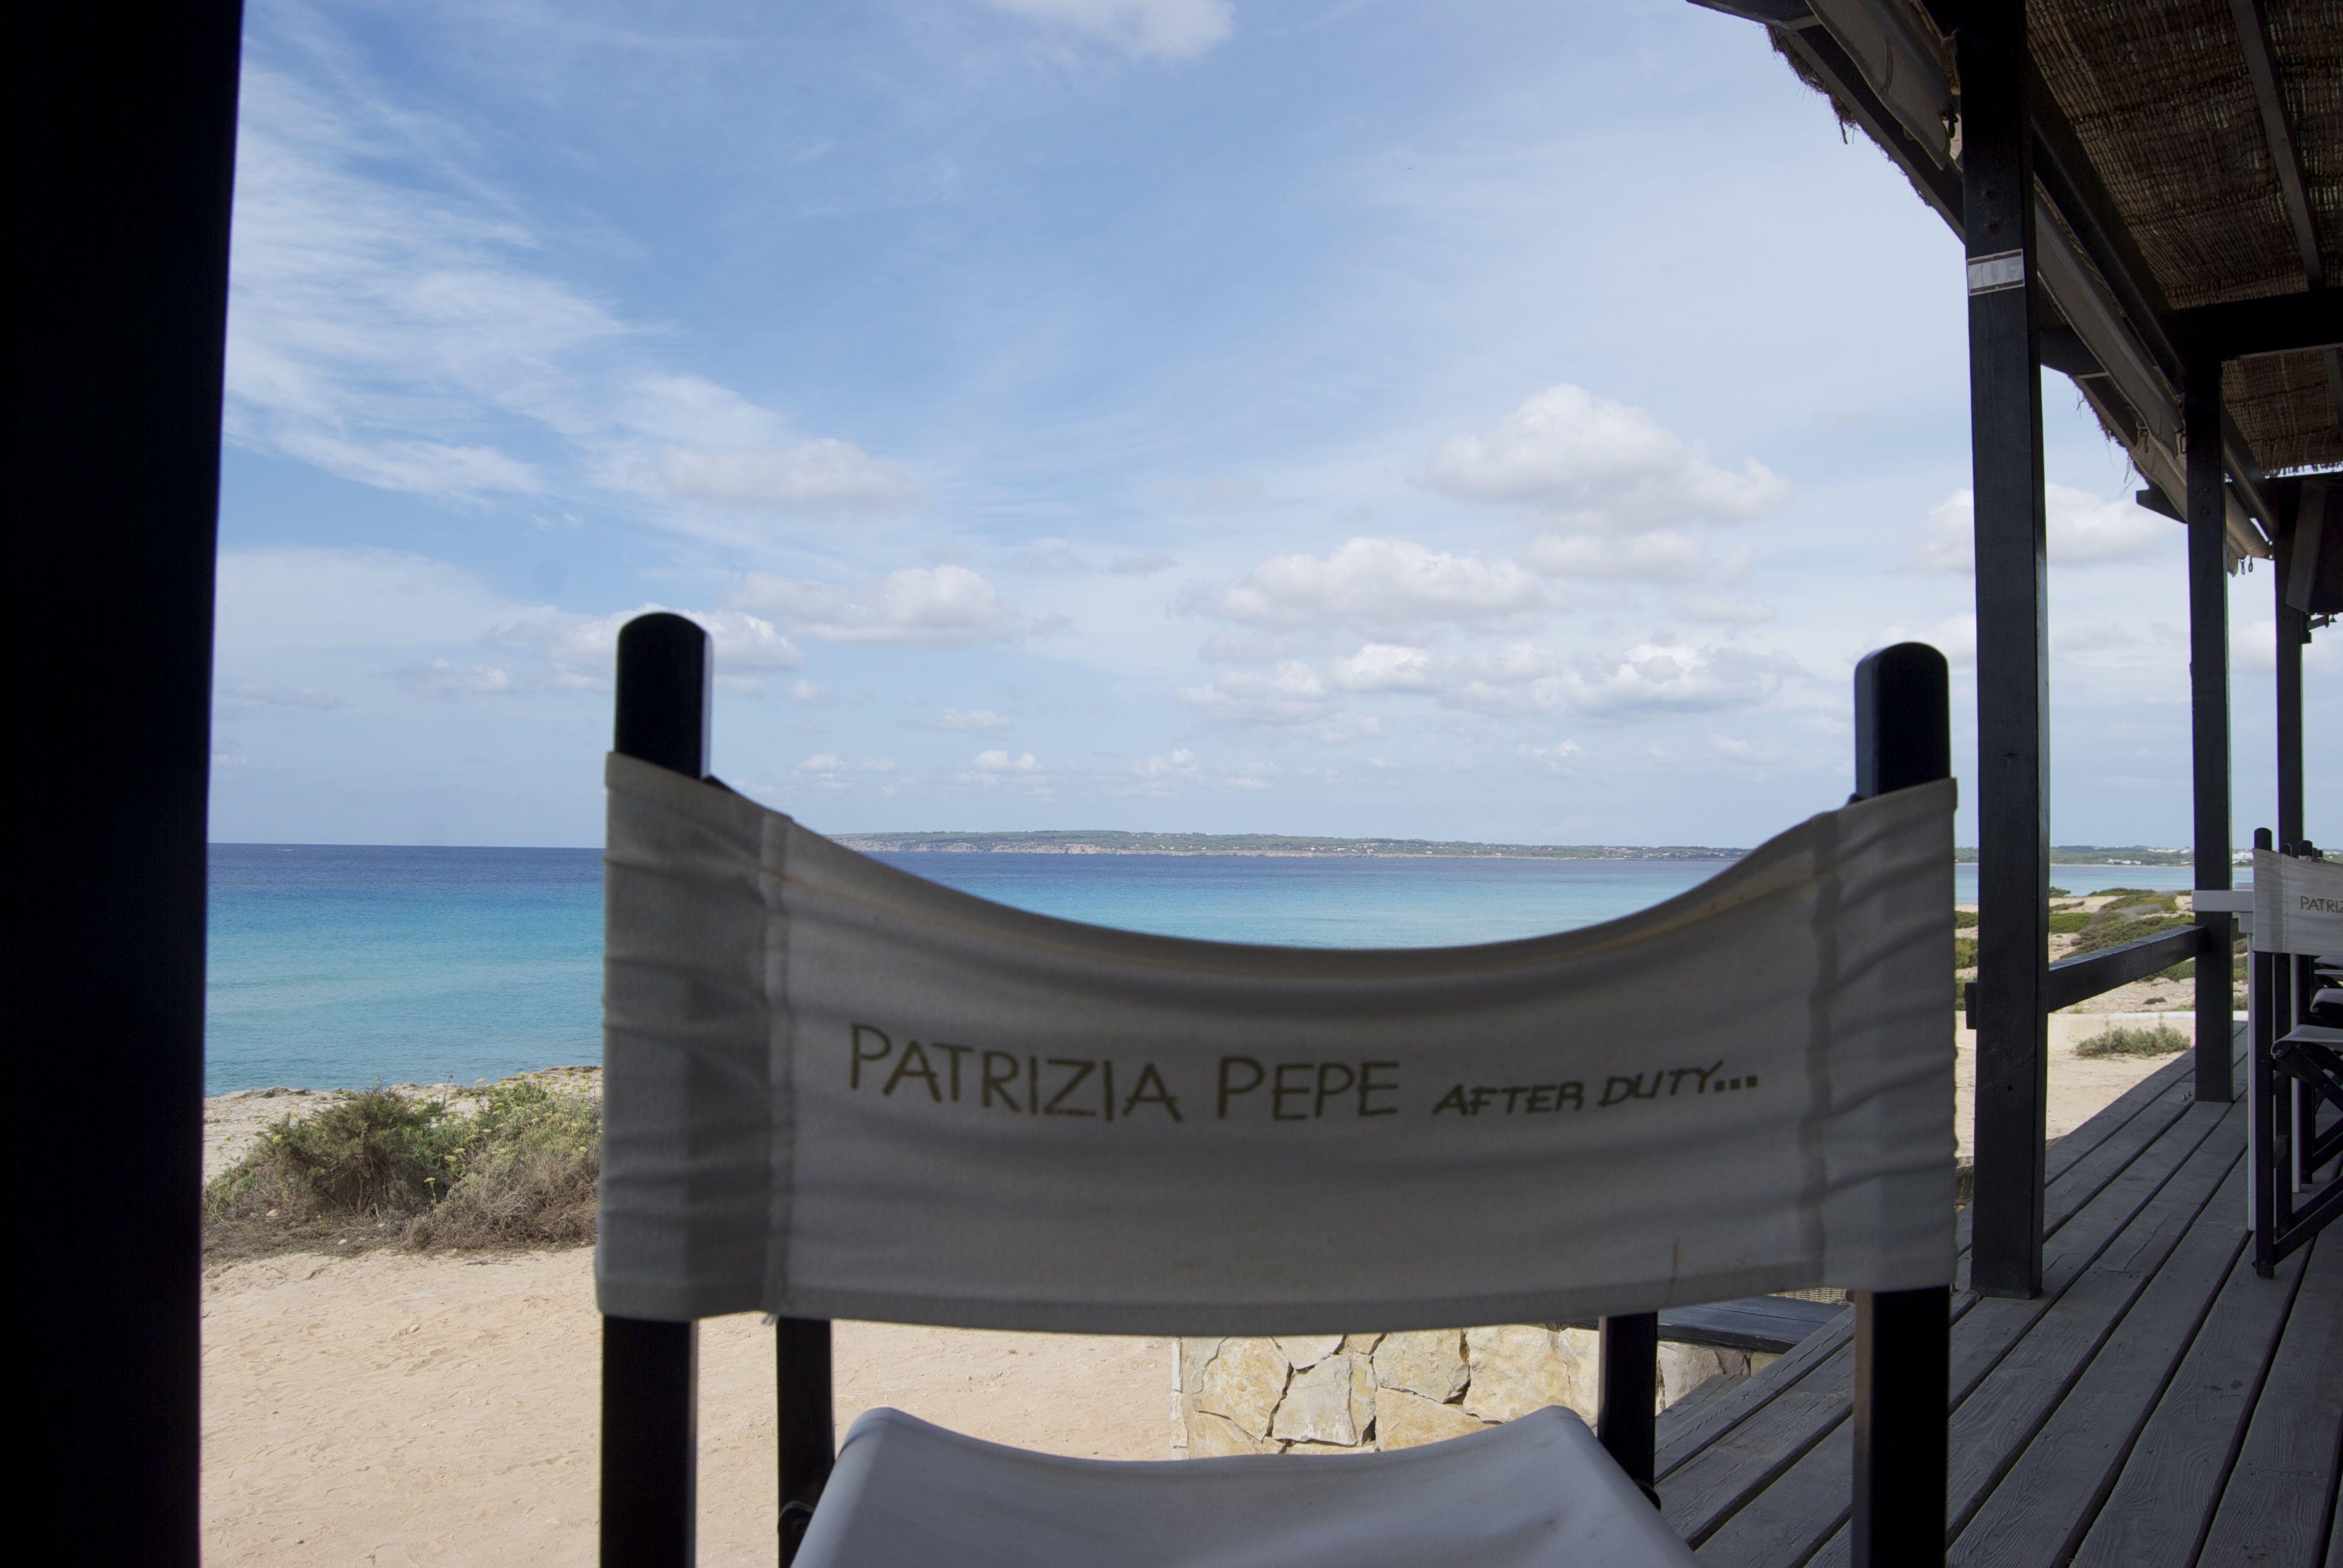 Restaurante Patrizia Pepe en Formentera